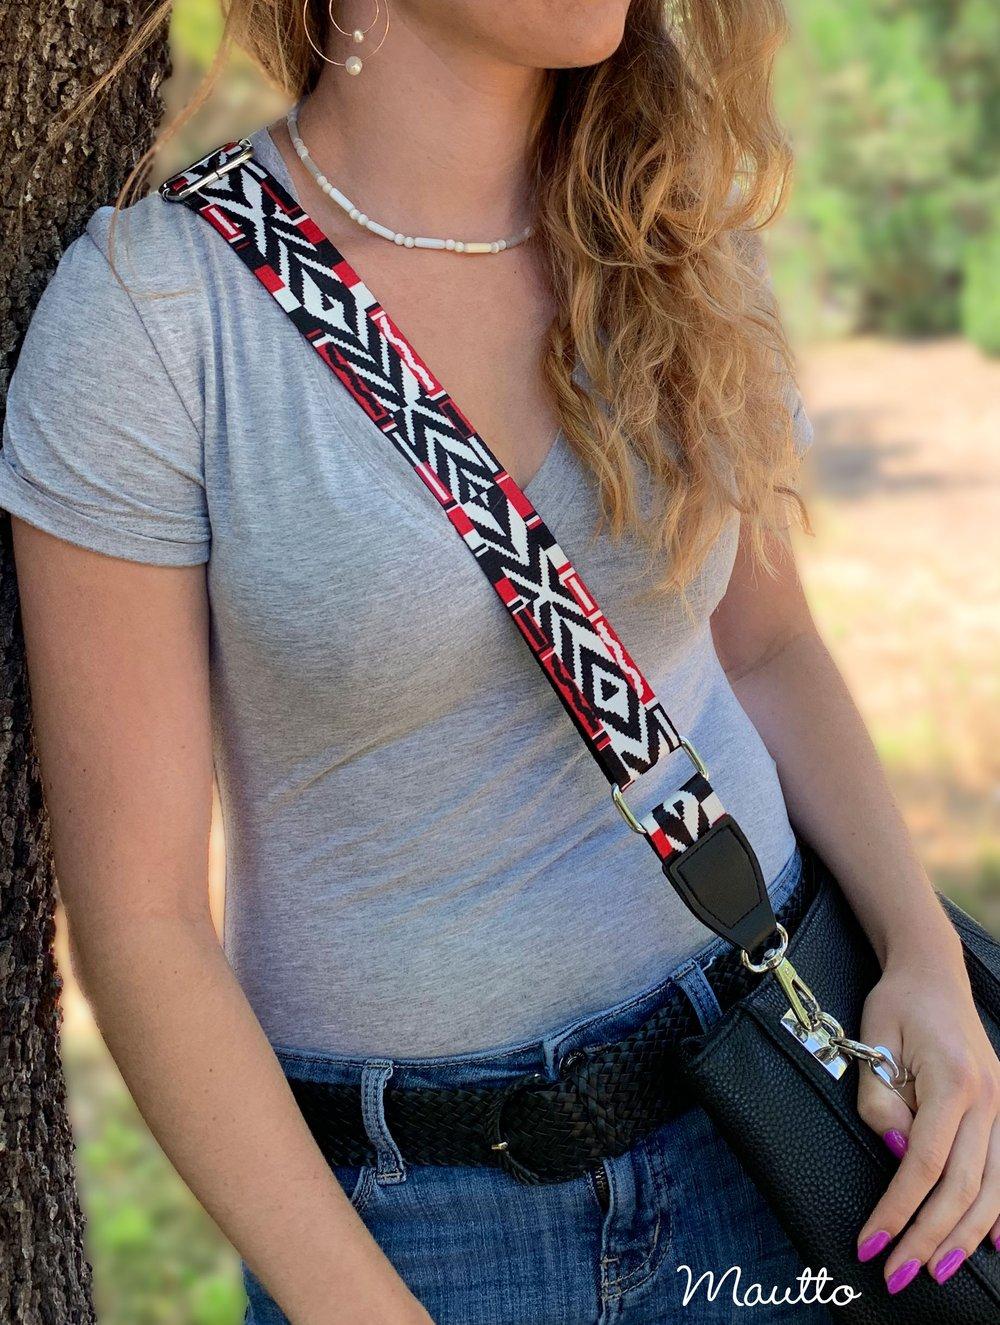 Image of Tribal Chevron Strap for Handbags - Aztec Herringbone Design - Adjustable Guitar-inspired Strap